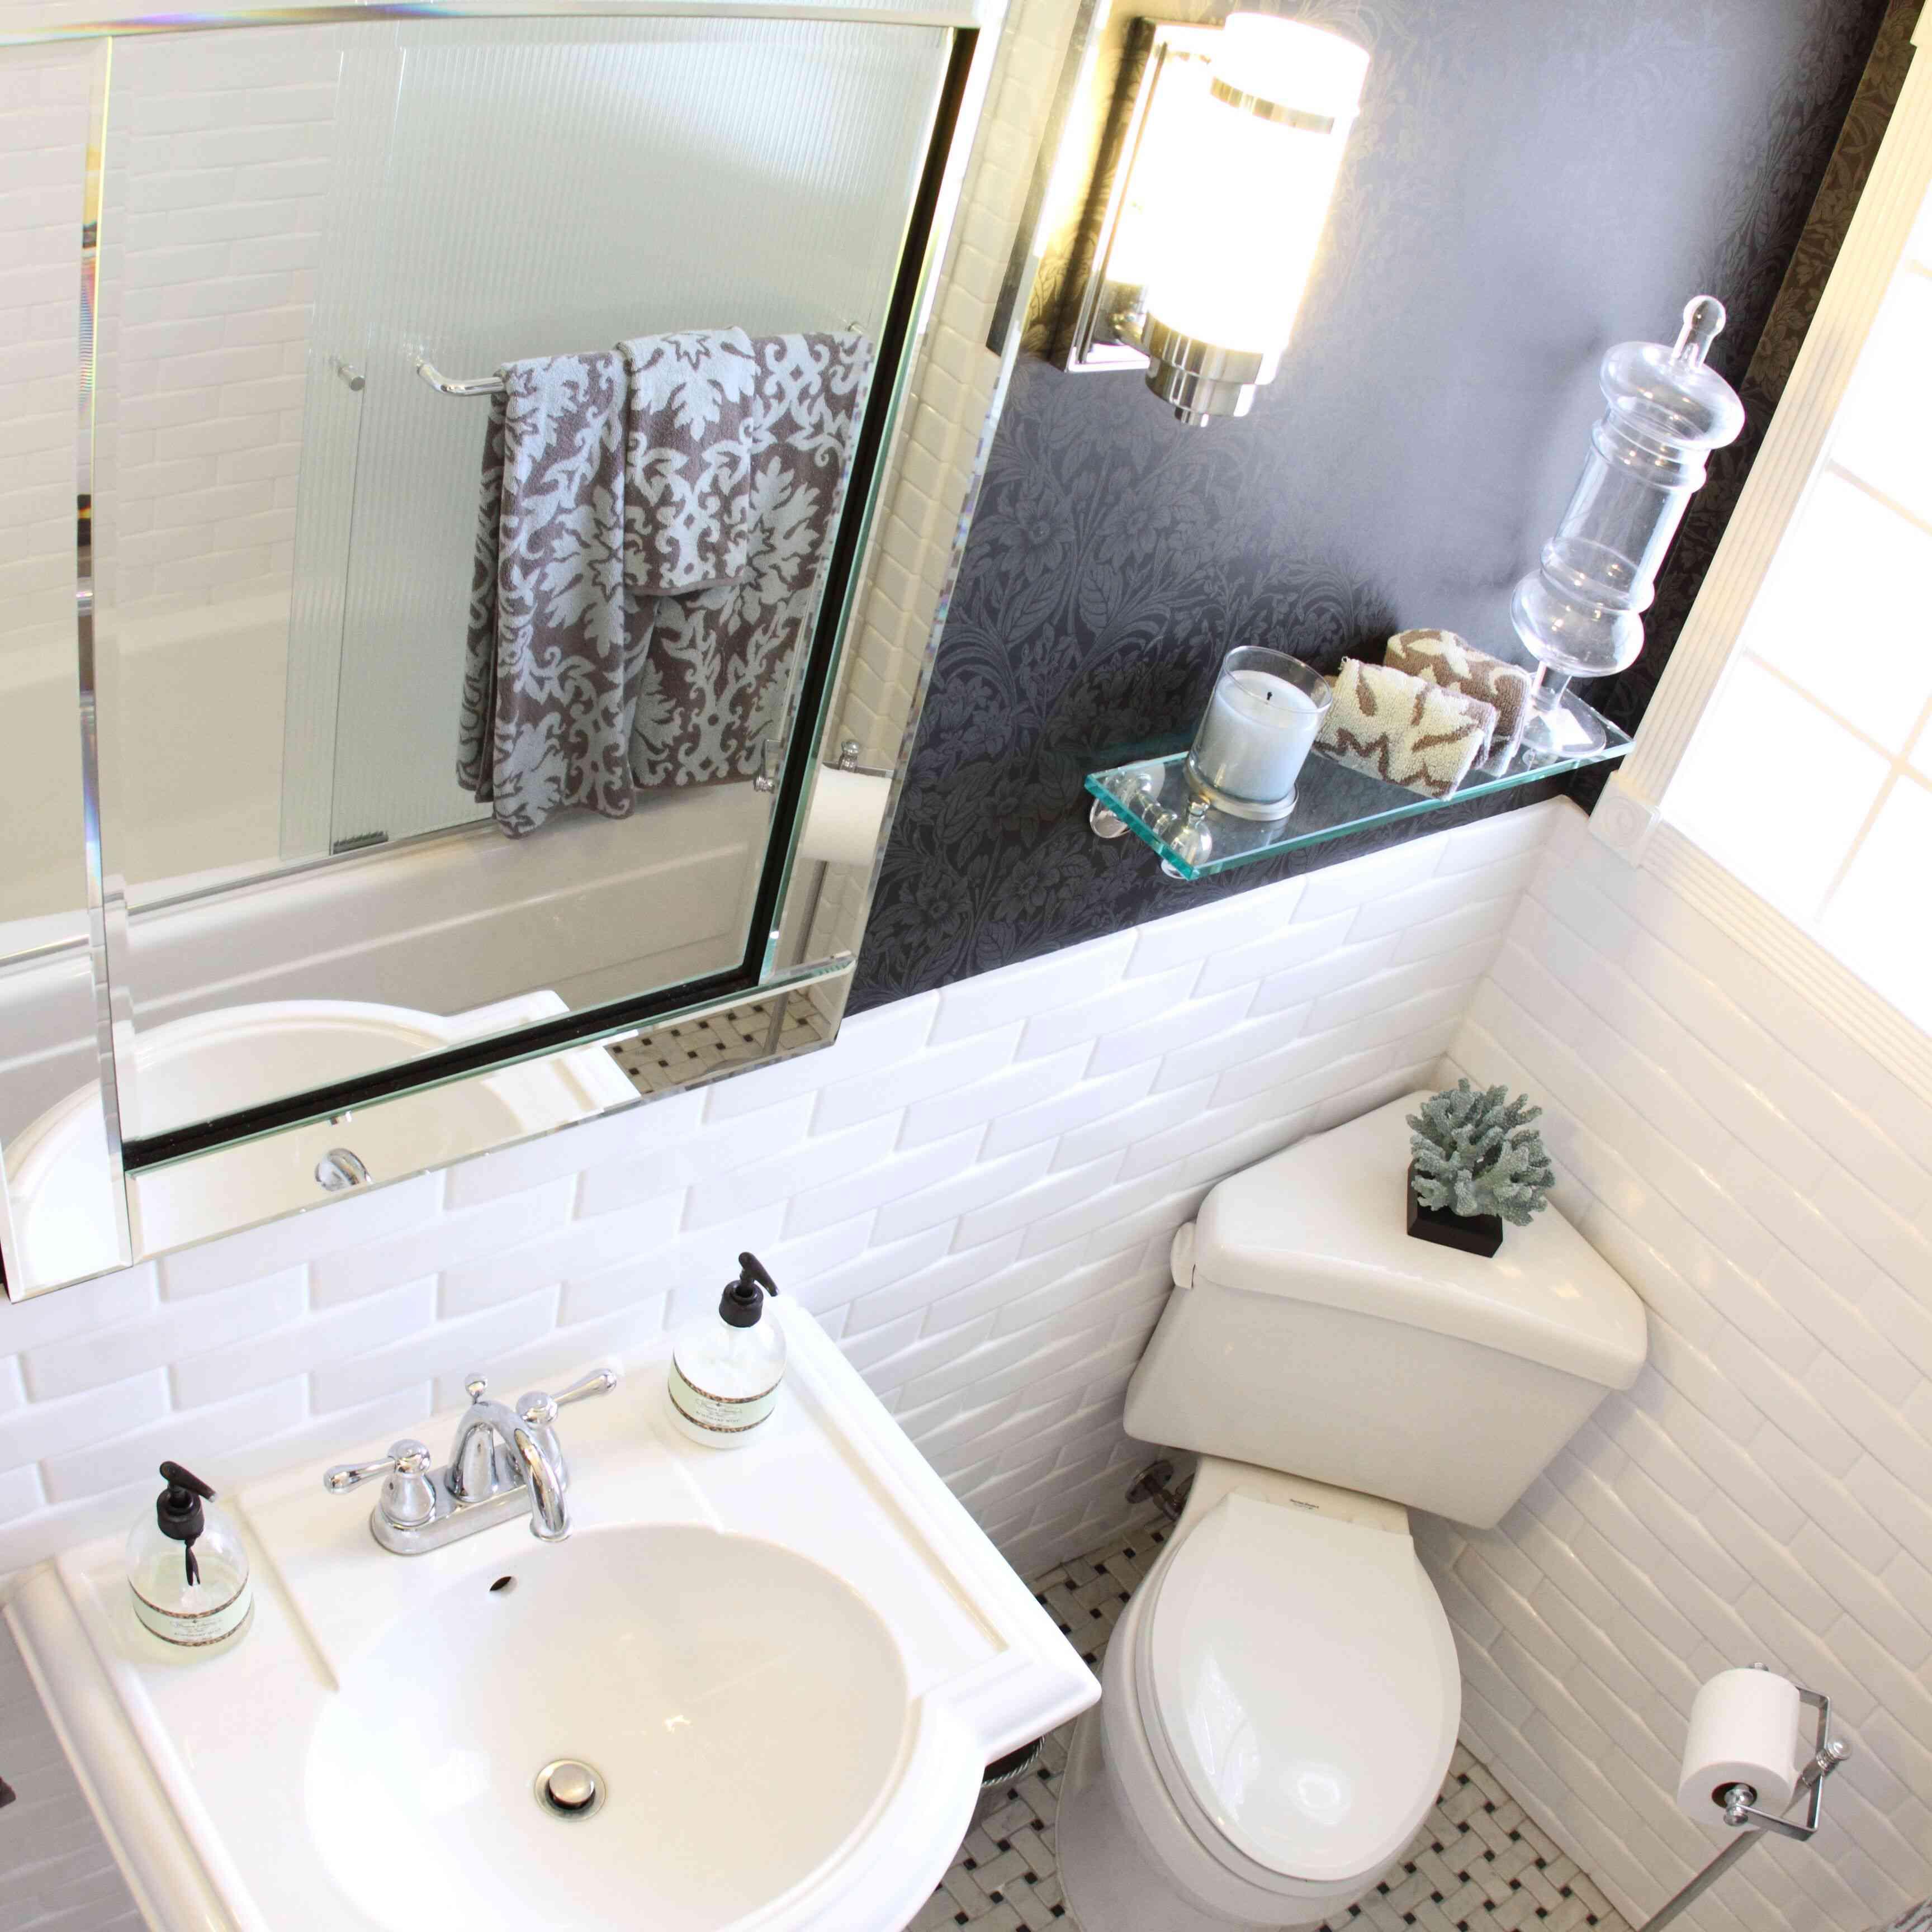 Art Deco Bathrooms That Make A Chic Statement